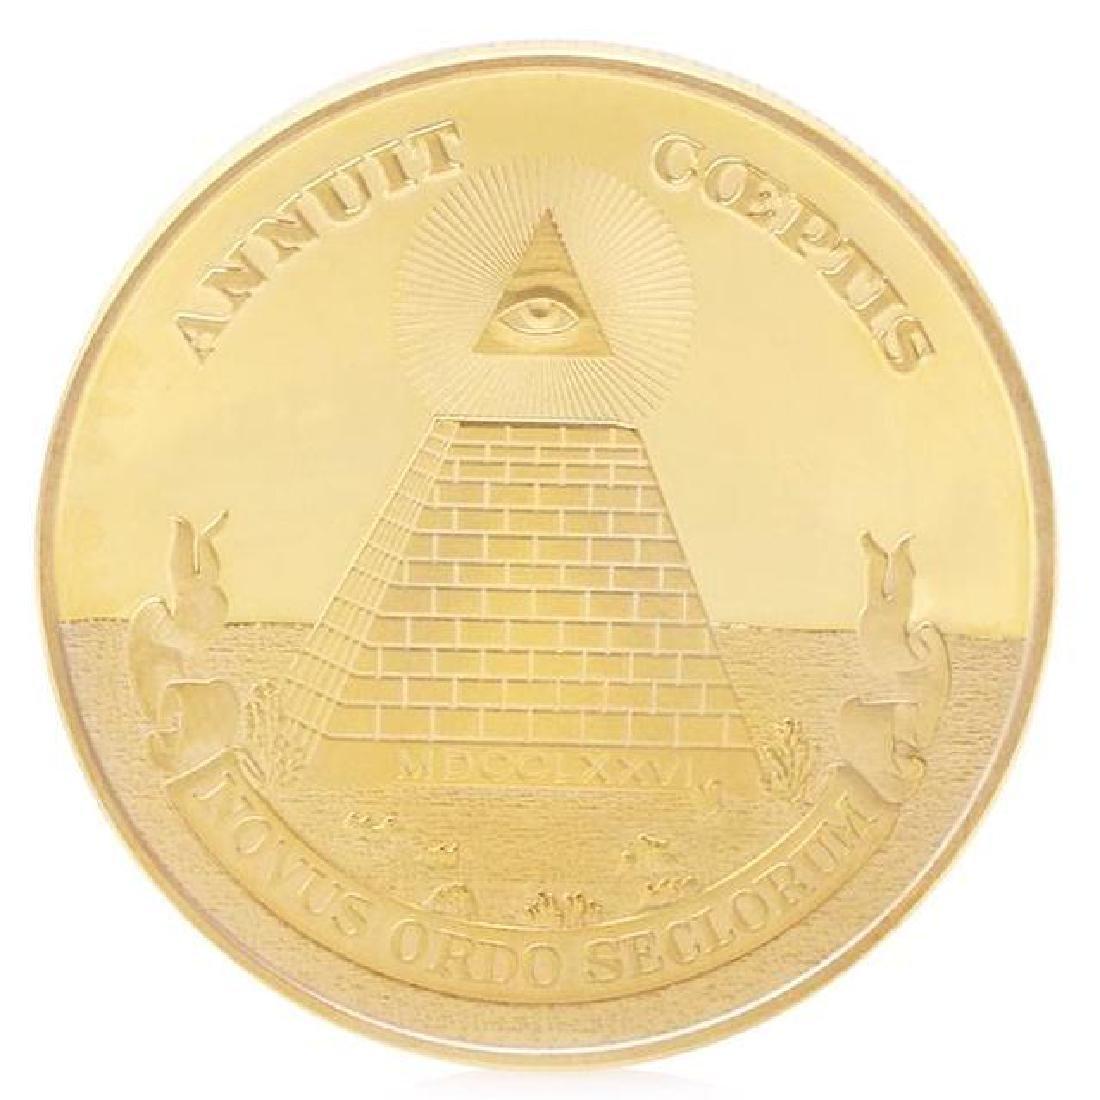 Illuminati Pyramid Gold Clad Coin